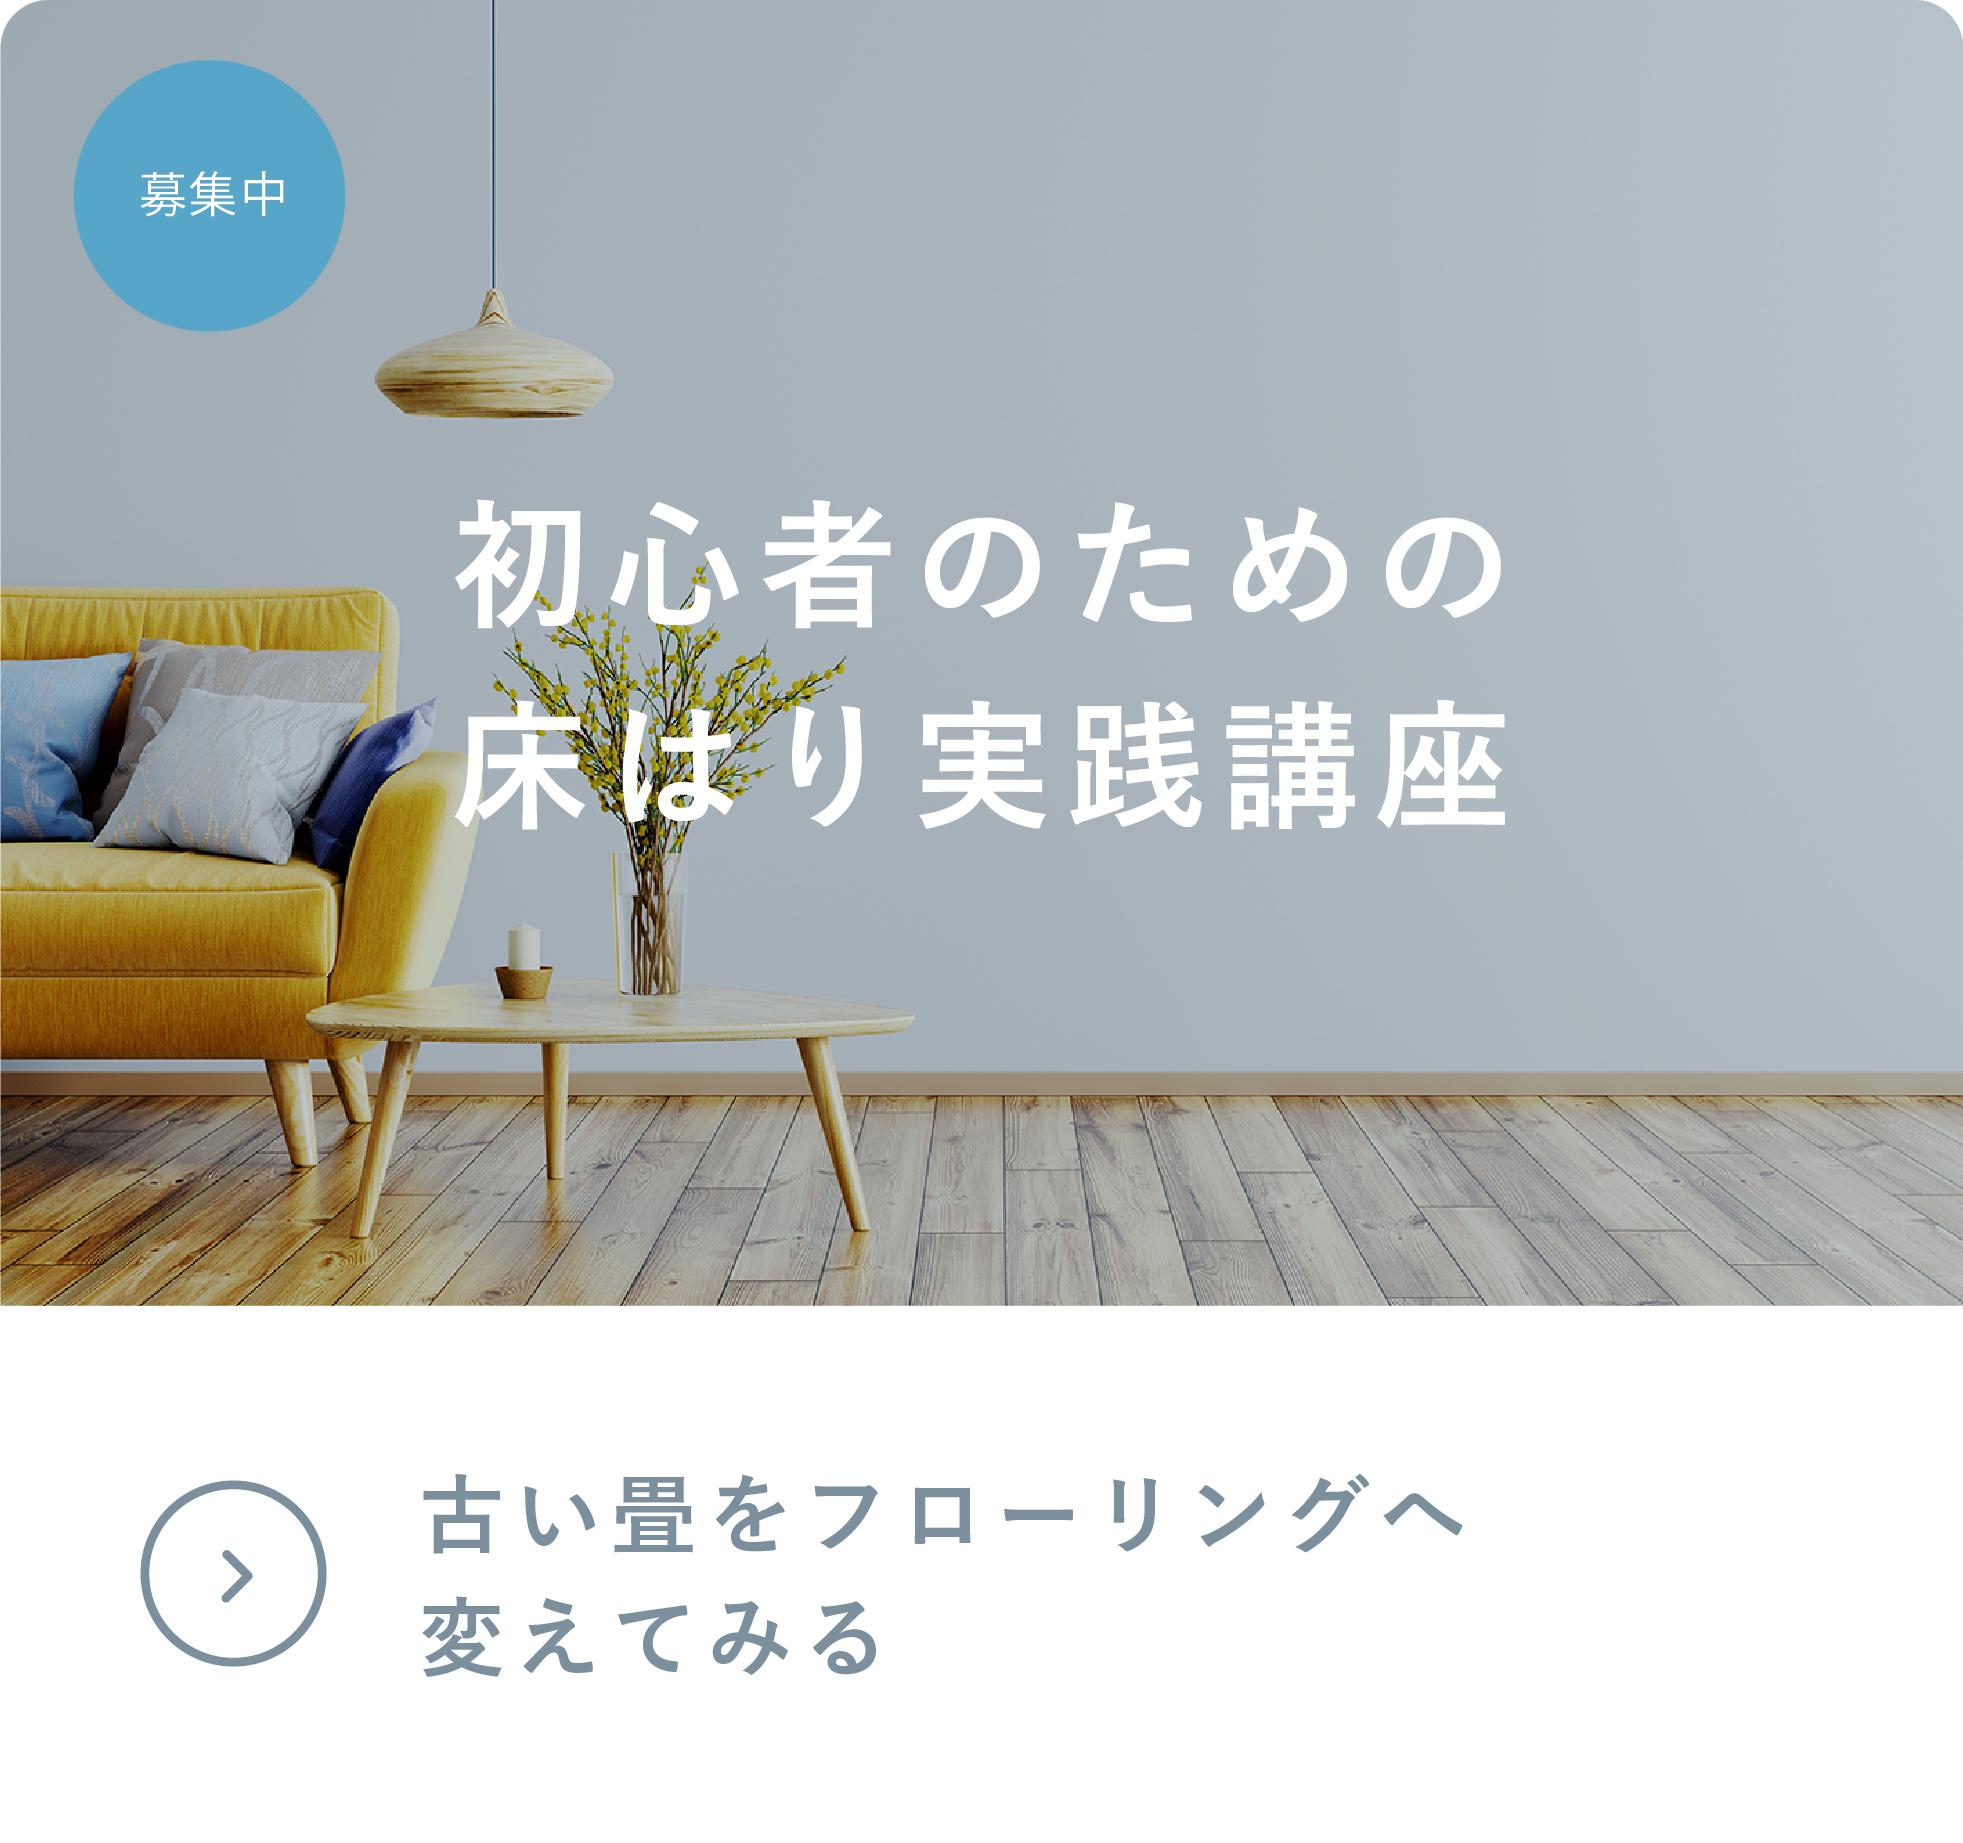 uonuma_yukahari_banner2